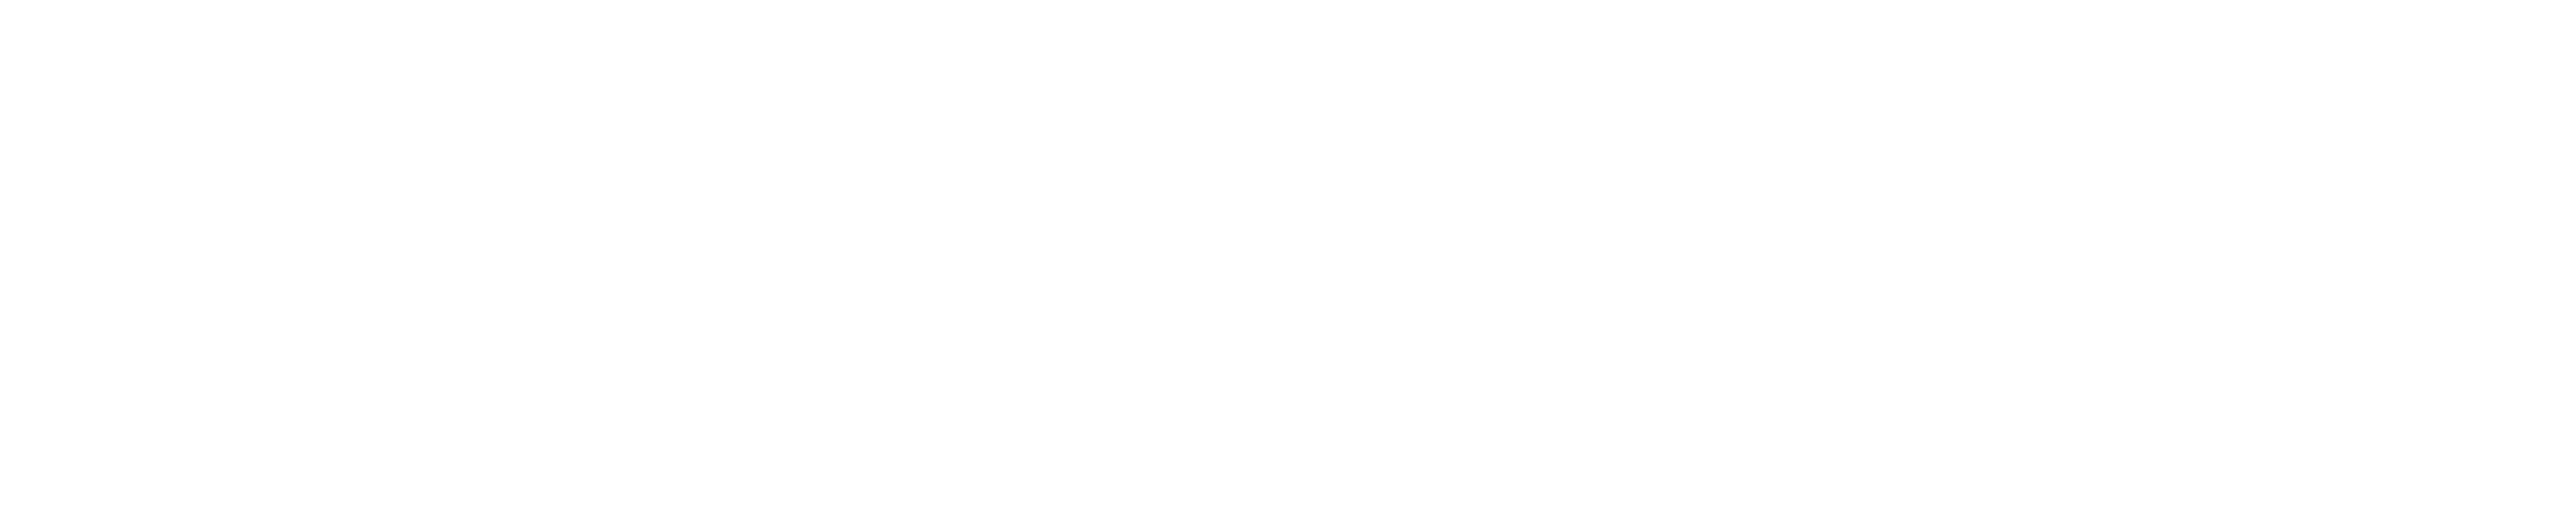 KvG Meisterbetrieb